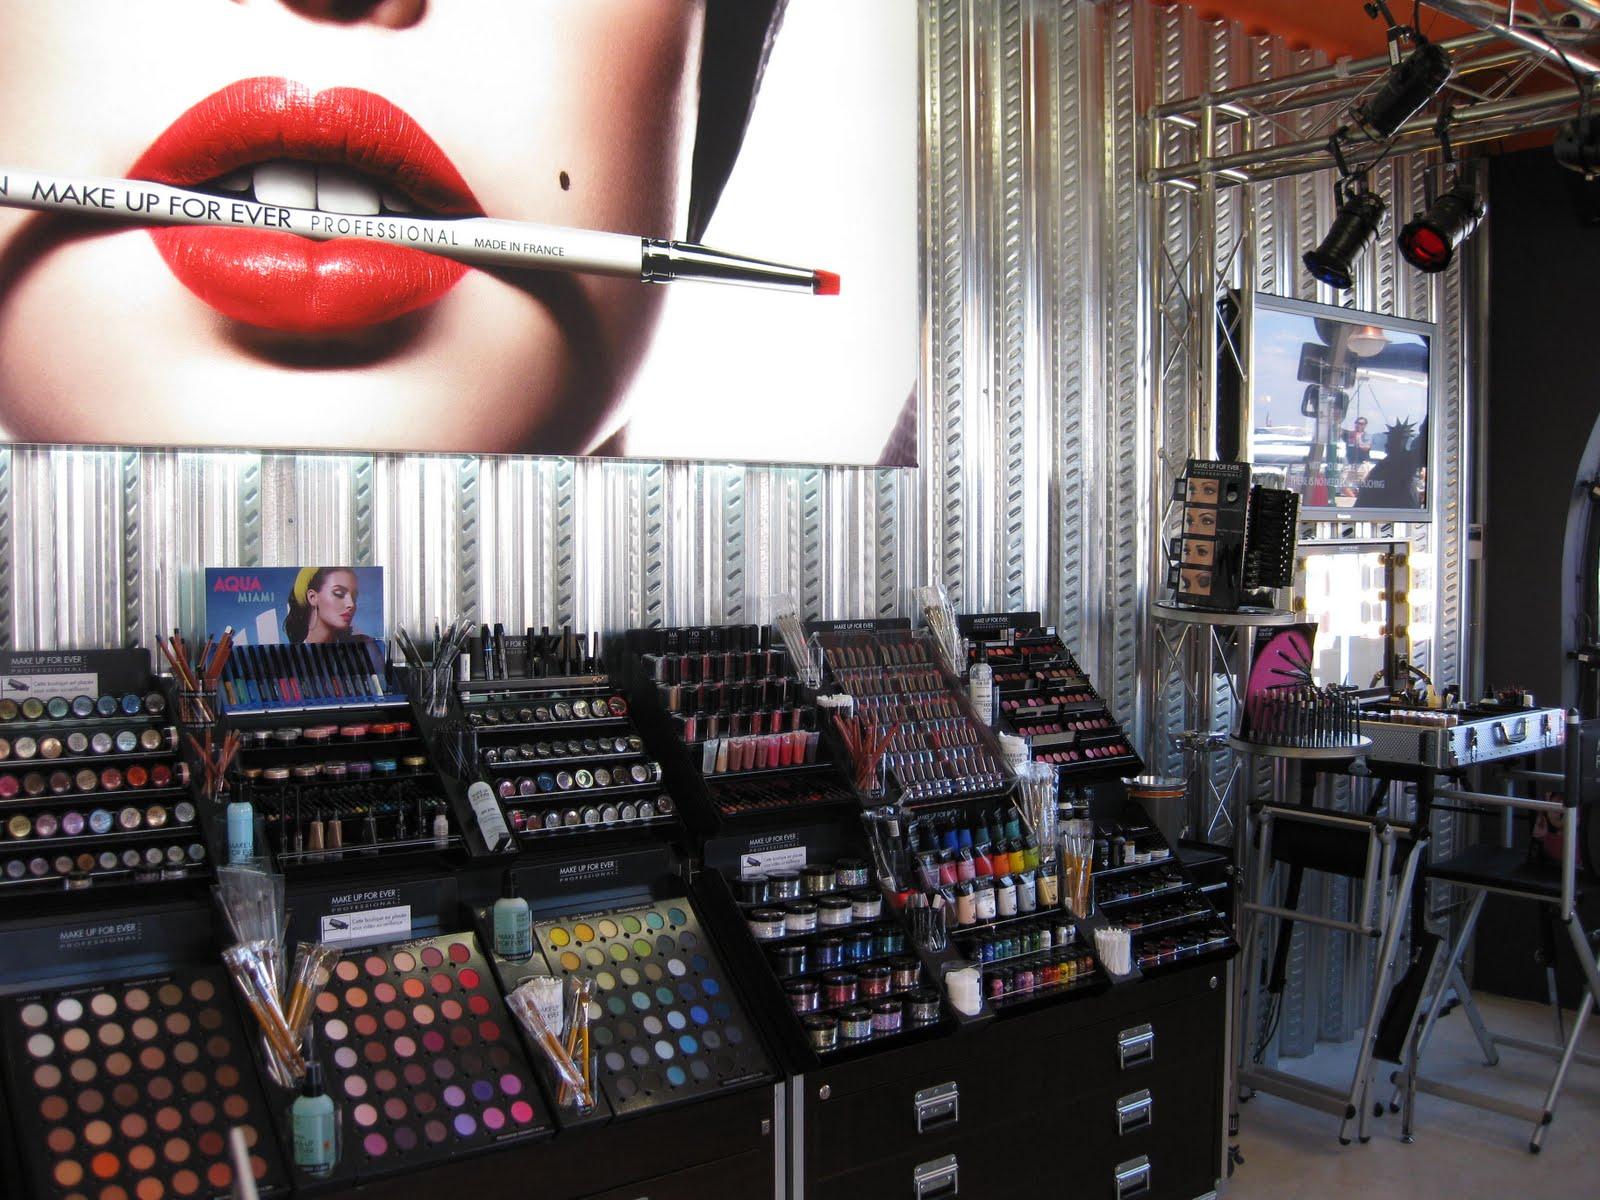 Make Up For Ever's St. Tropez Pop Up Store | Jet Set Girls